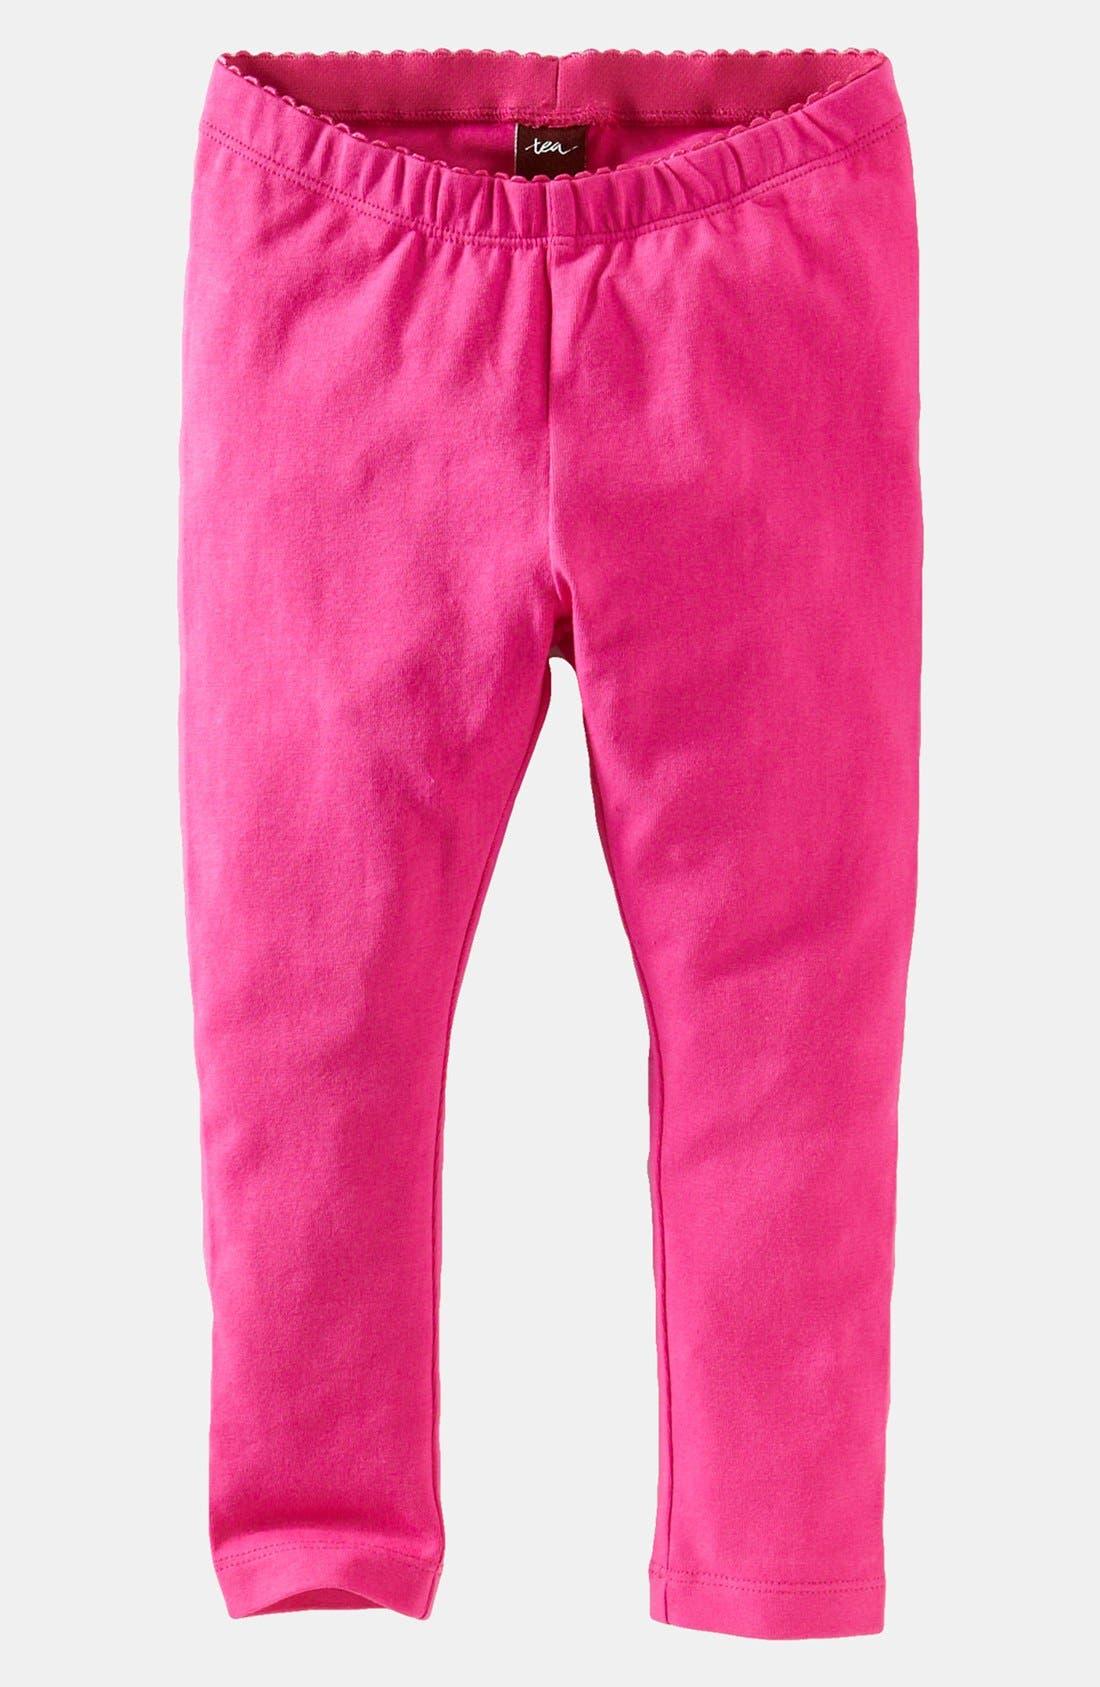 Main Image - Tea Collection Skinny Stretch Leggings (Toddler Girls)